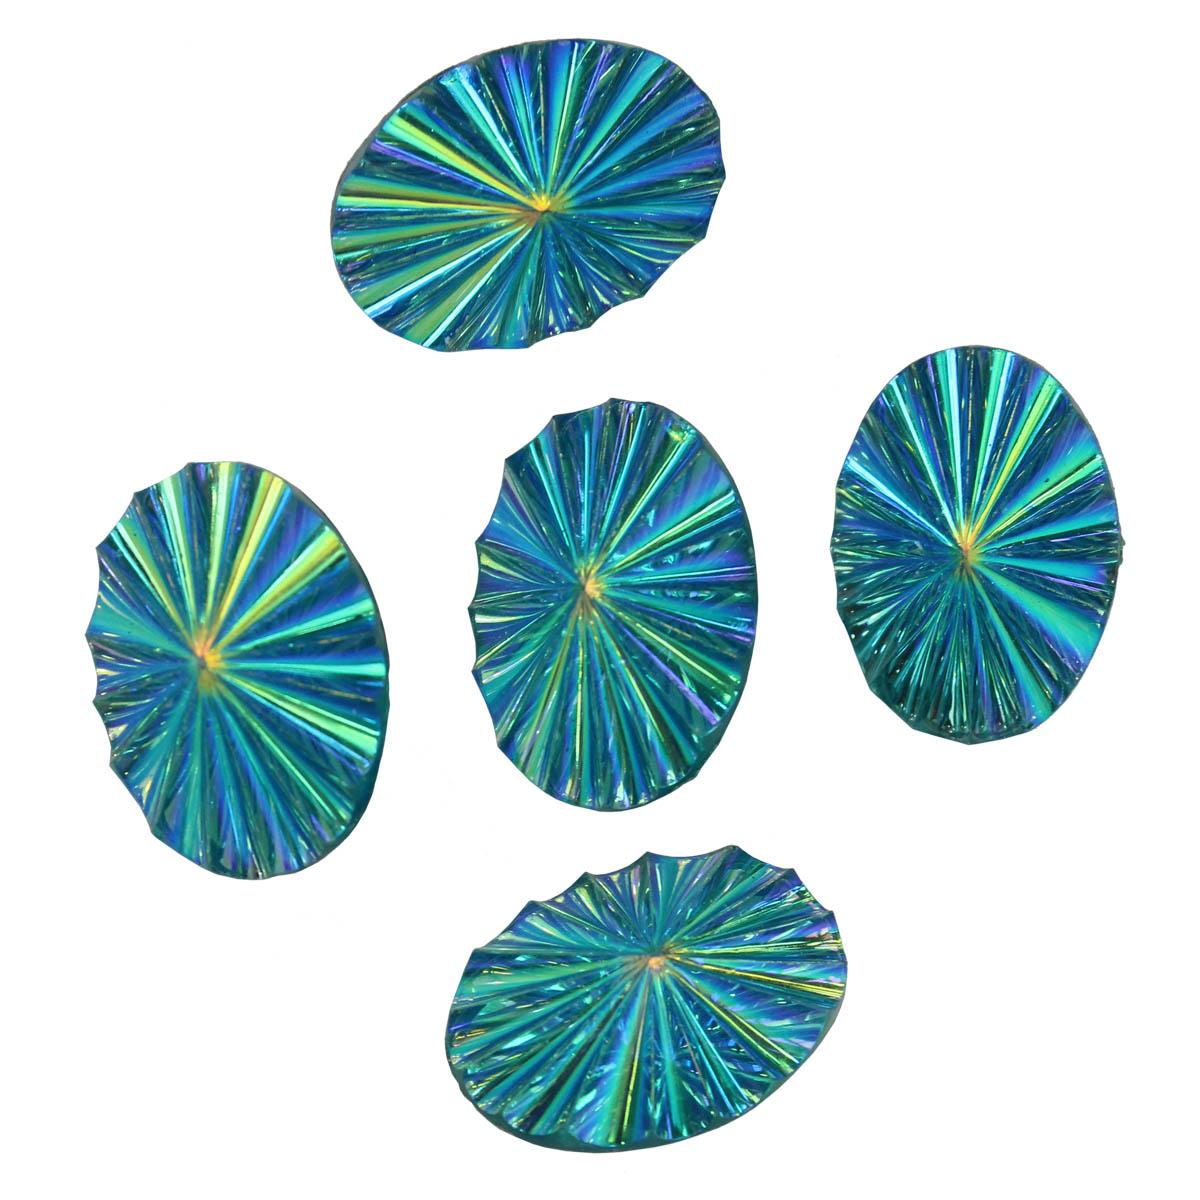 Пуговицы 'Кристал' 9PPC7558 18*25мм, 5шт